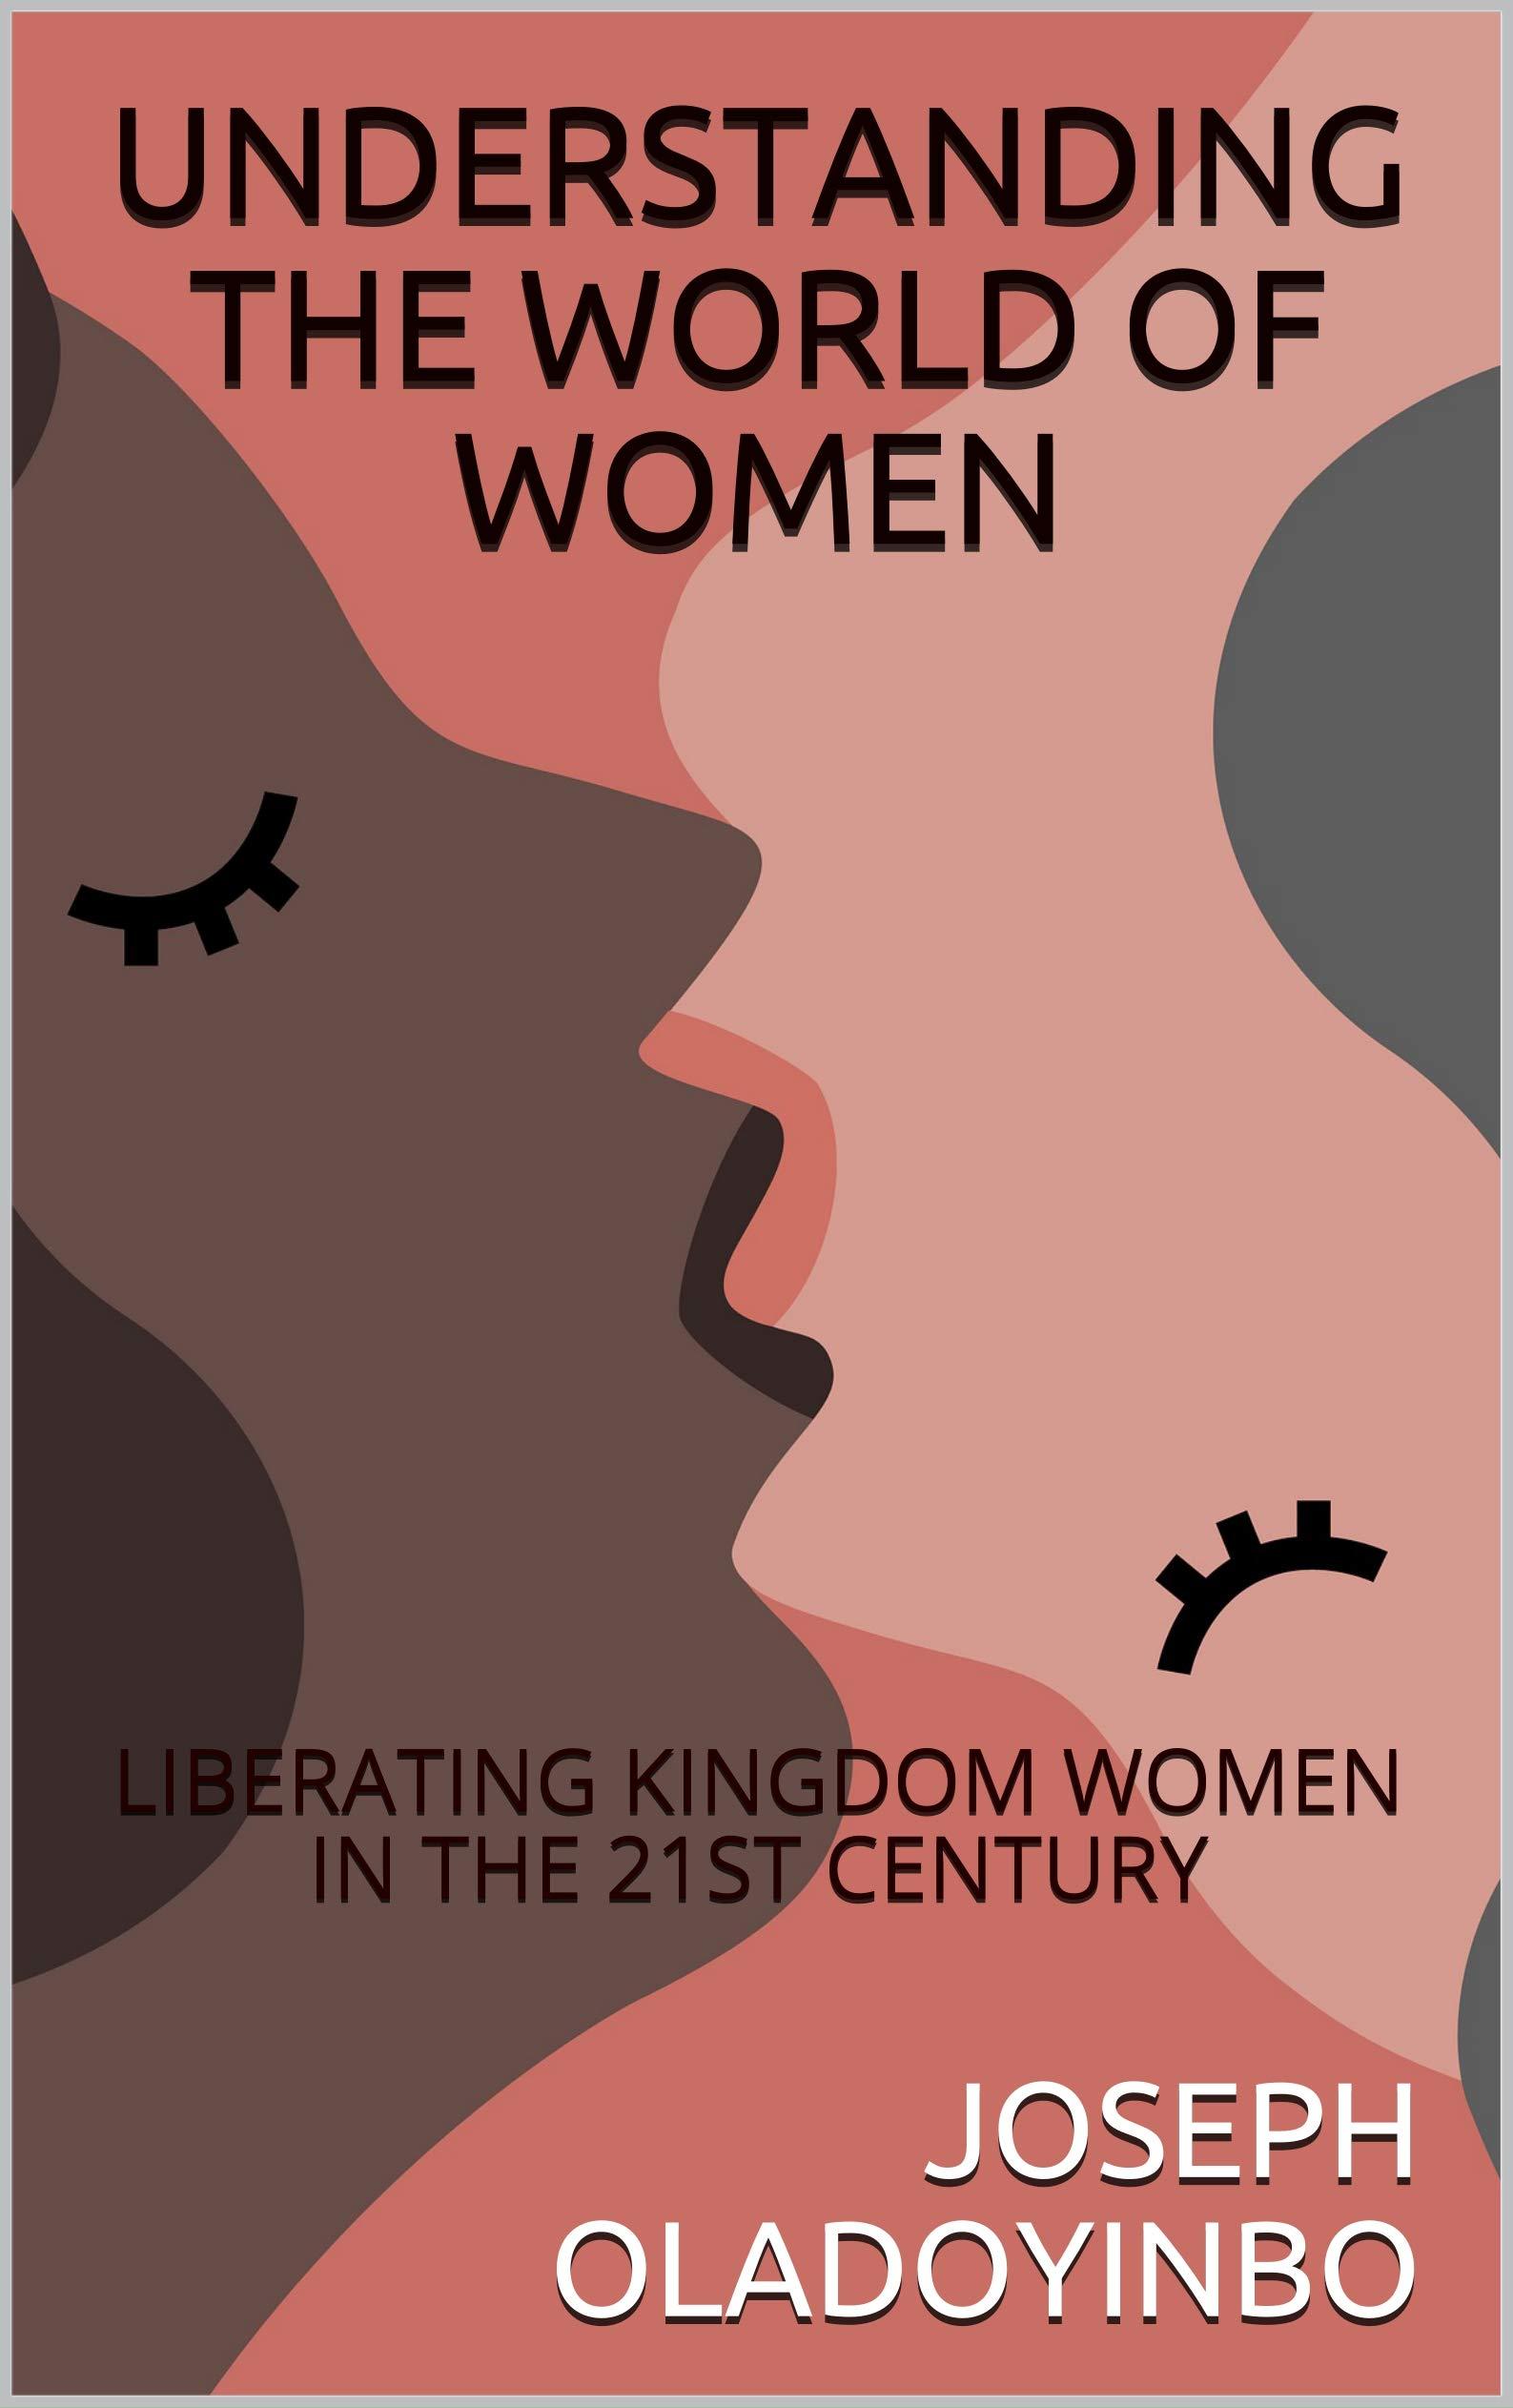 UNDERSTANDING THE WORLD OF WOMEN: LIBERATING KINGDOM WOMEN IN THE 21ST CENTURY